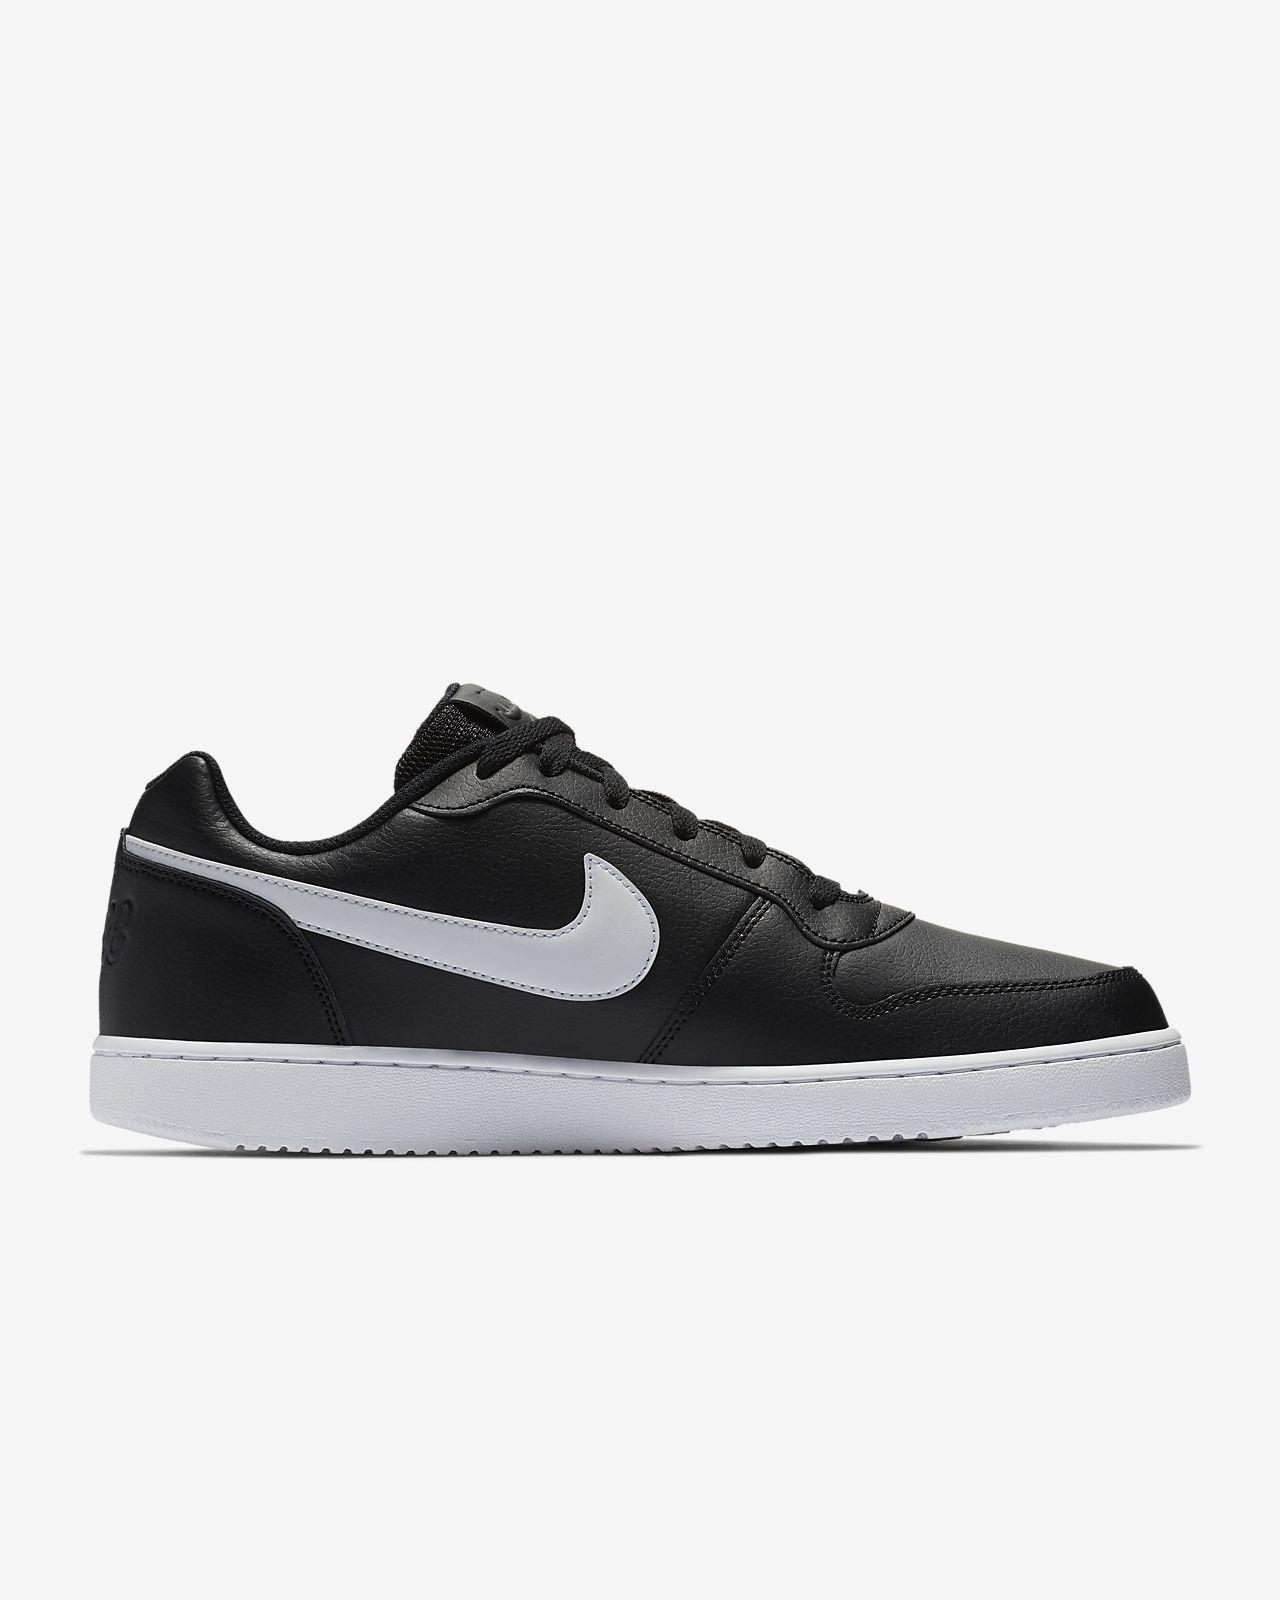 Low Ebernon Homme Nike Pour Chaussure mv0OnwN8